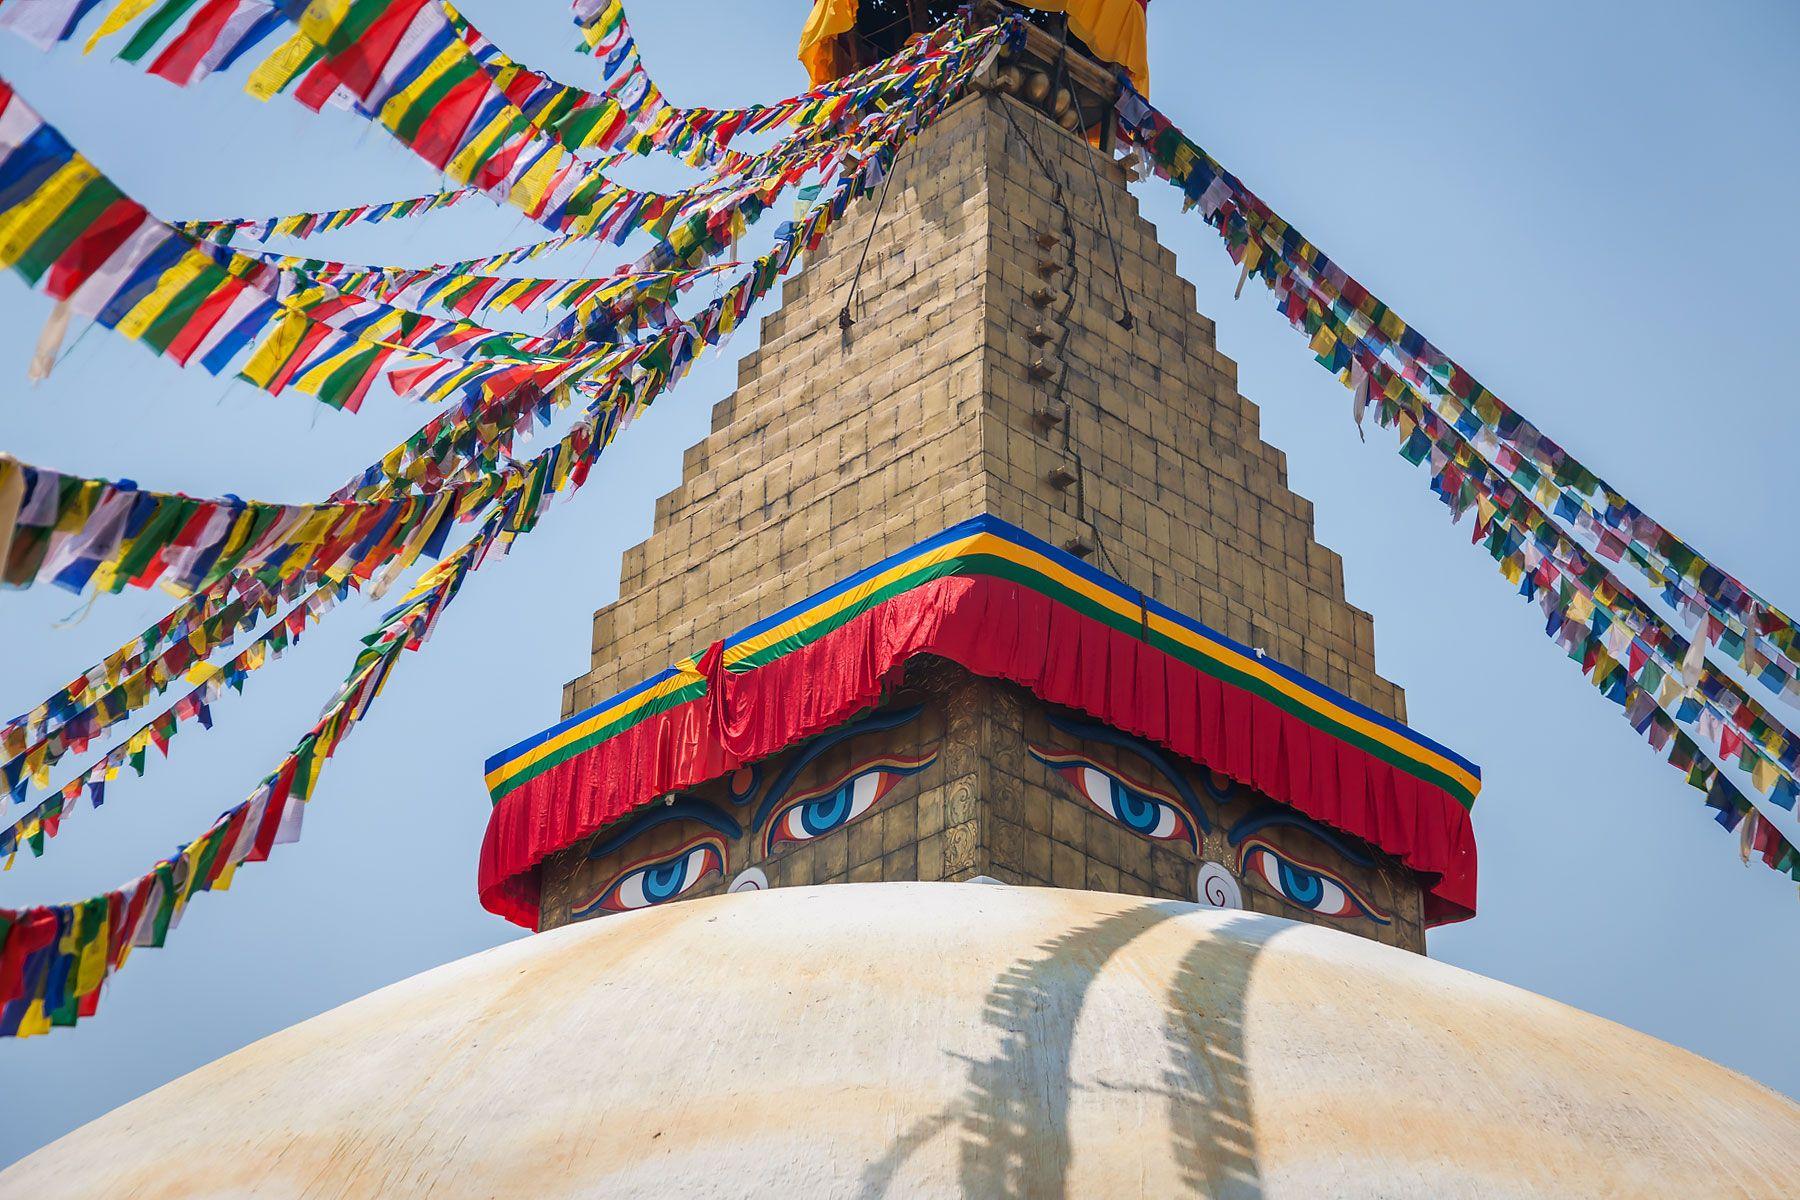 KathmanduNepal-003.jpg